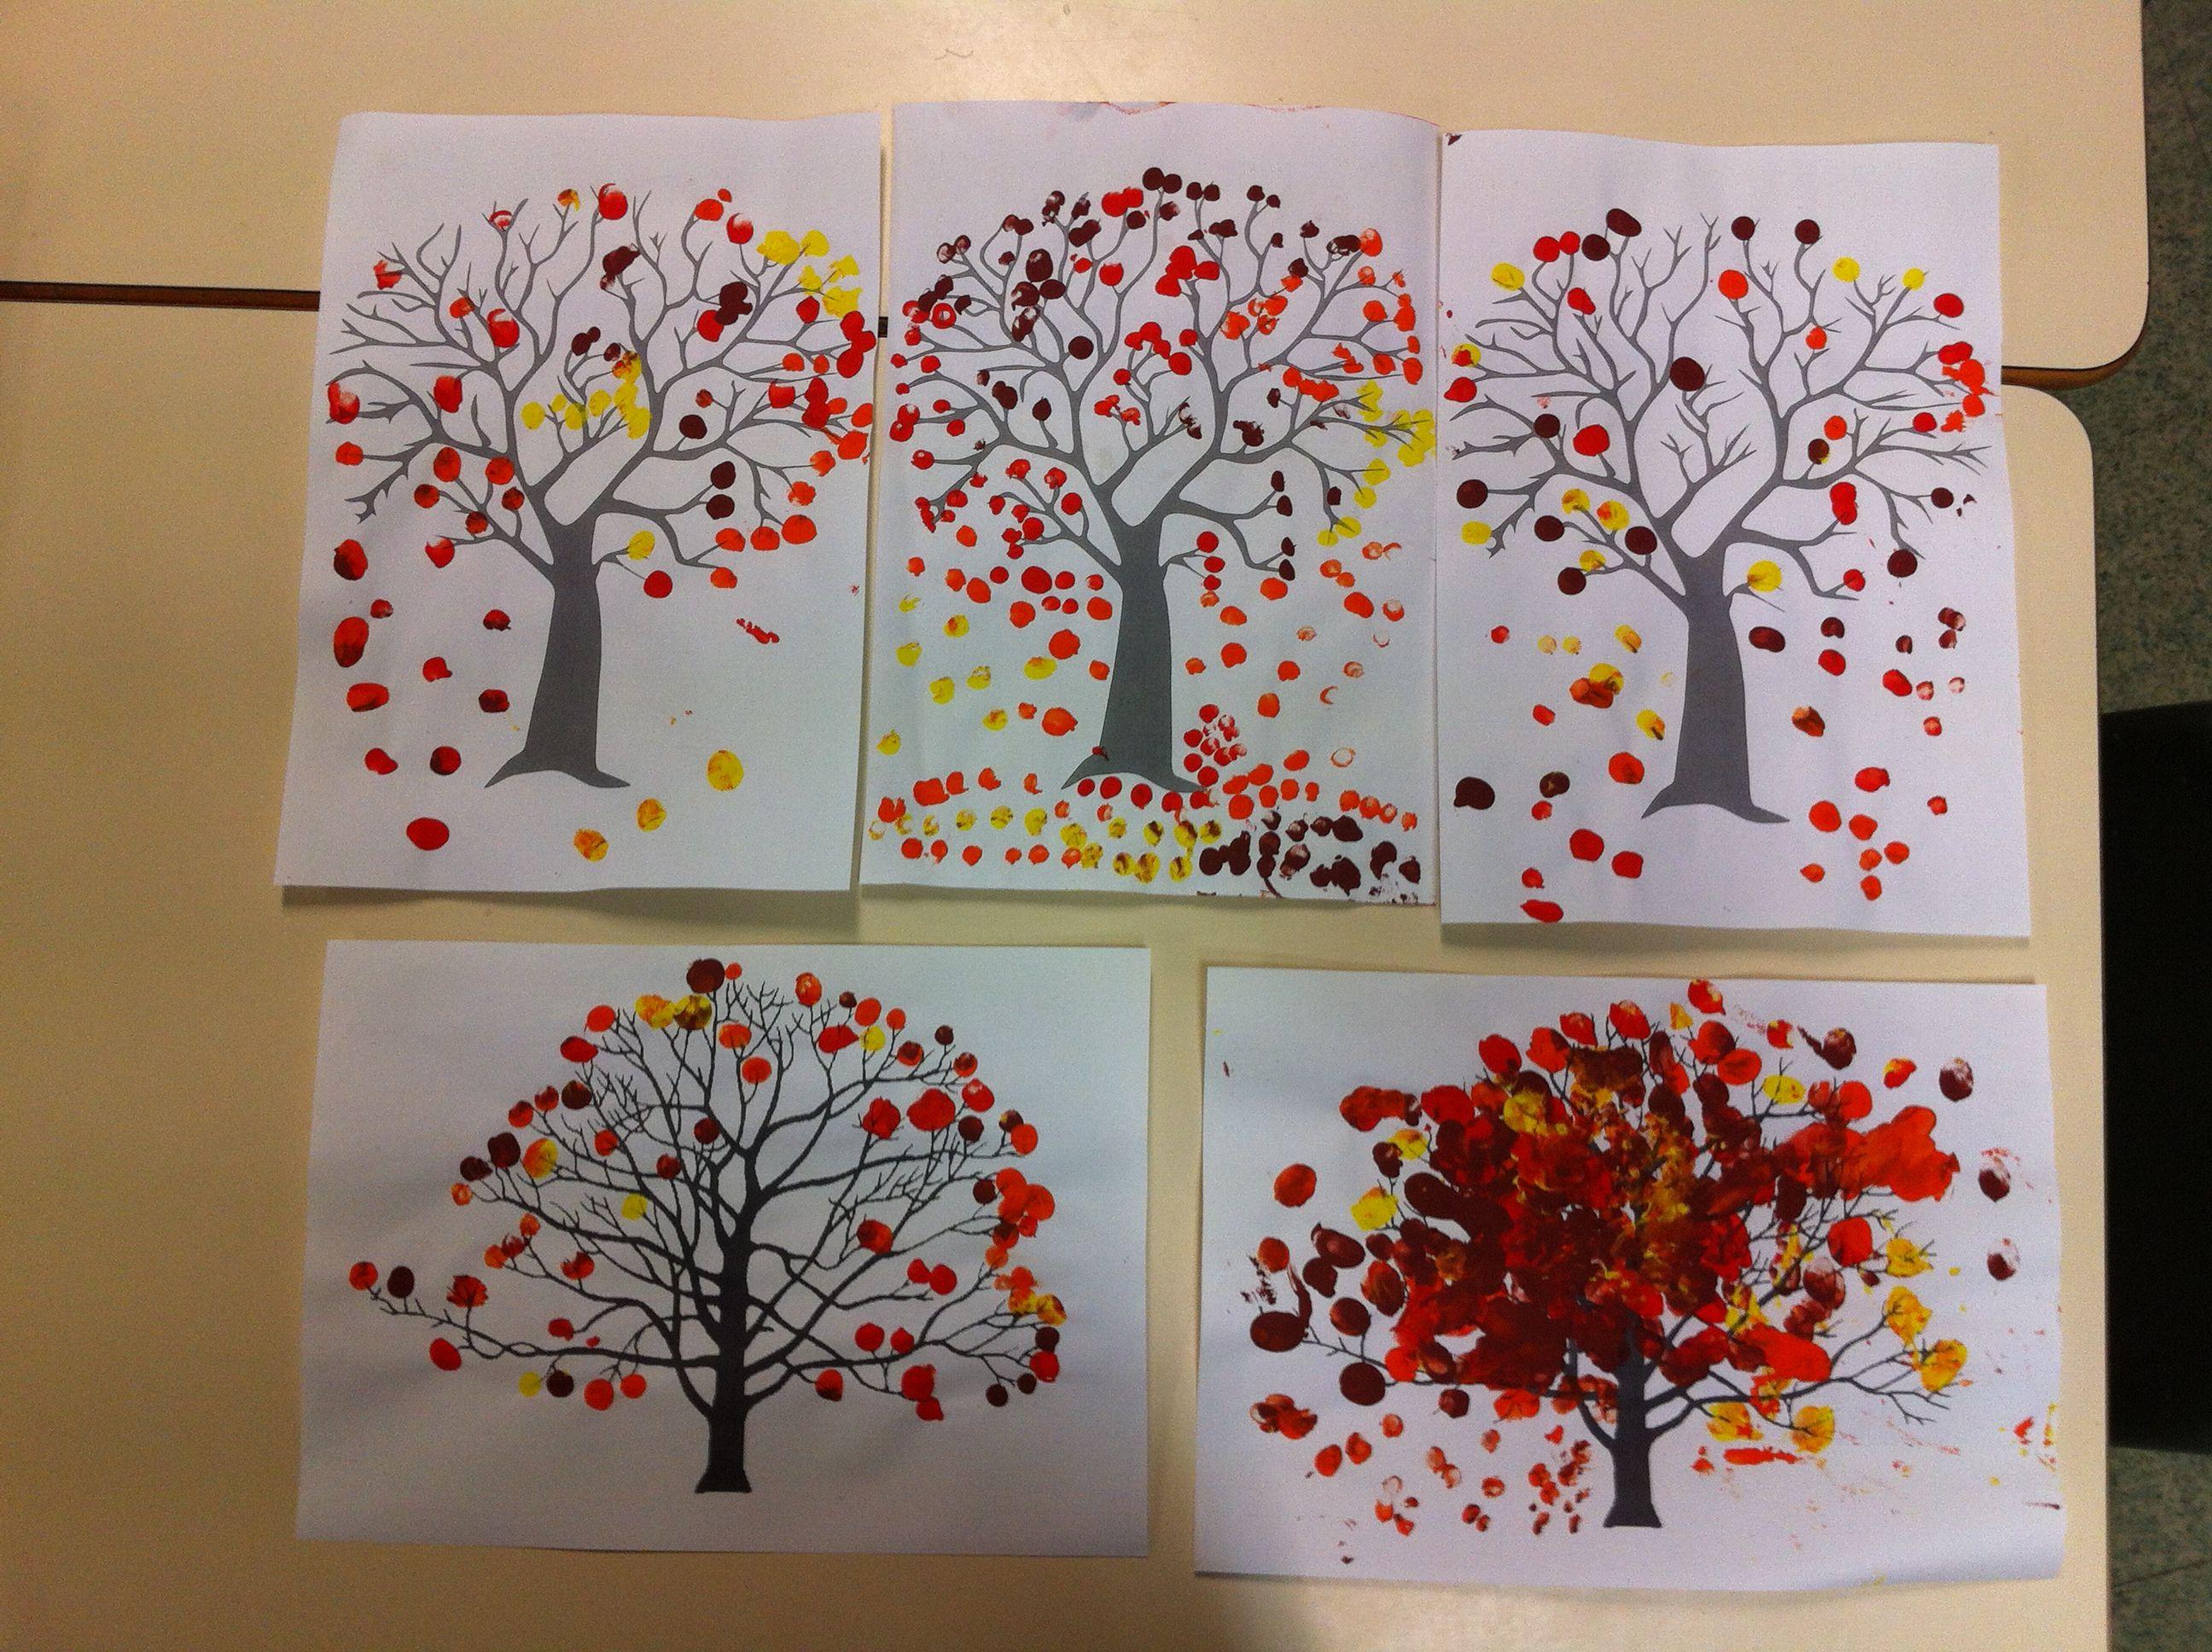 nos arbres d 39 automne tr s facile et rapide l 39 arbre arbre automne automne et bricolage enfant. Black Bedroom Furniture Sets. Home Design Ideas